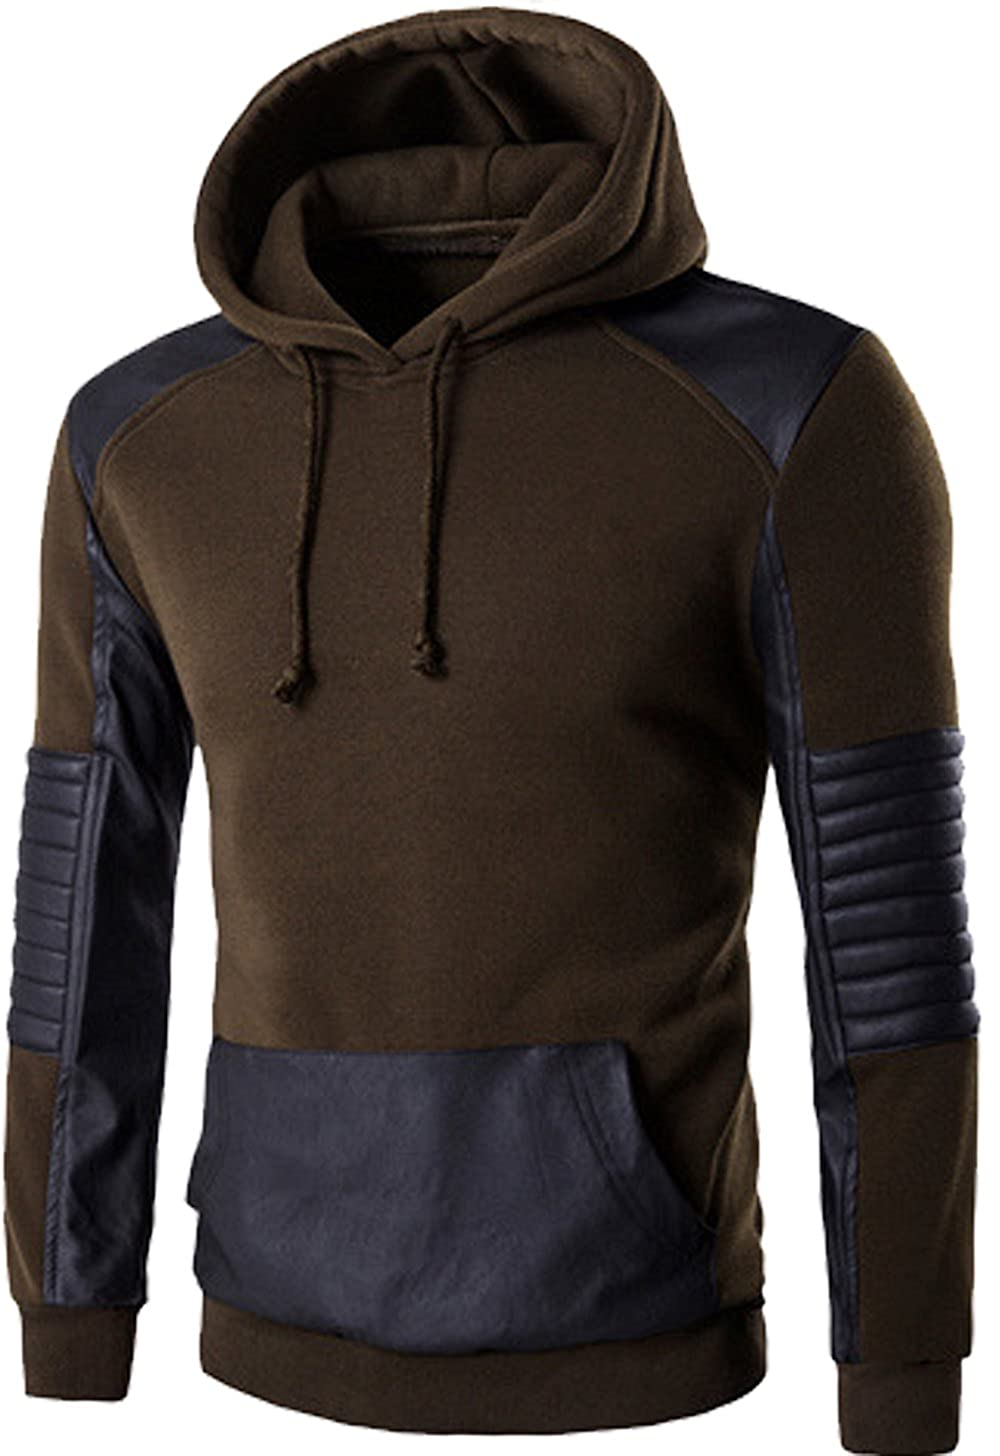 SWORLD Mens Hip Hop Color Block Color Stitching Drawstring Hooded Pullover Sweatshirts